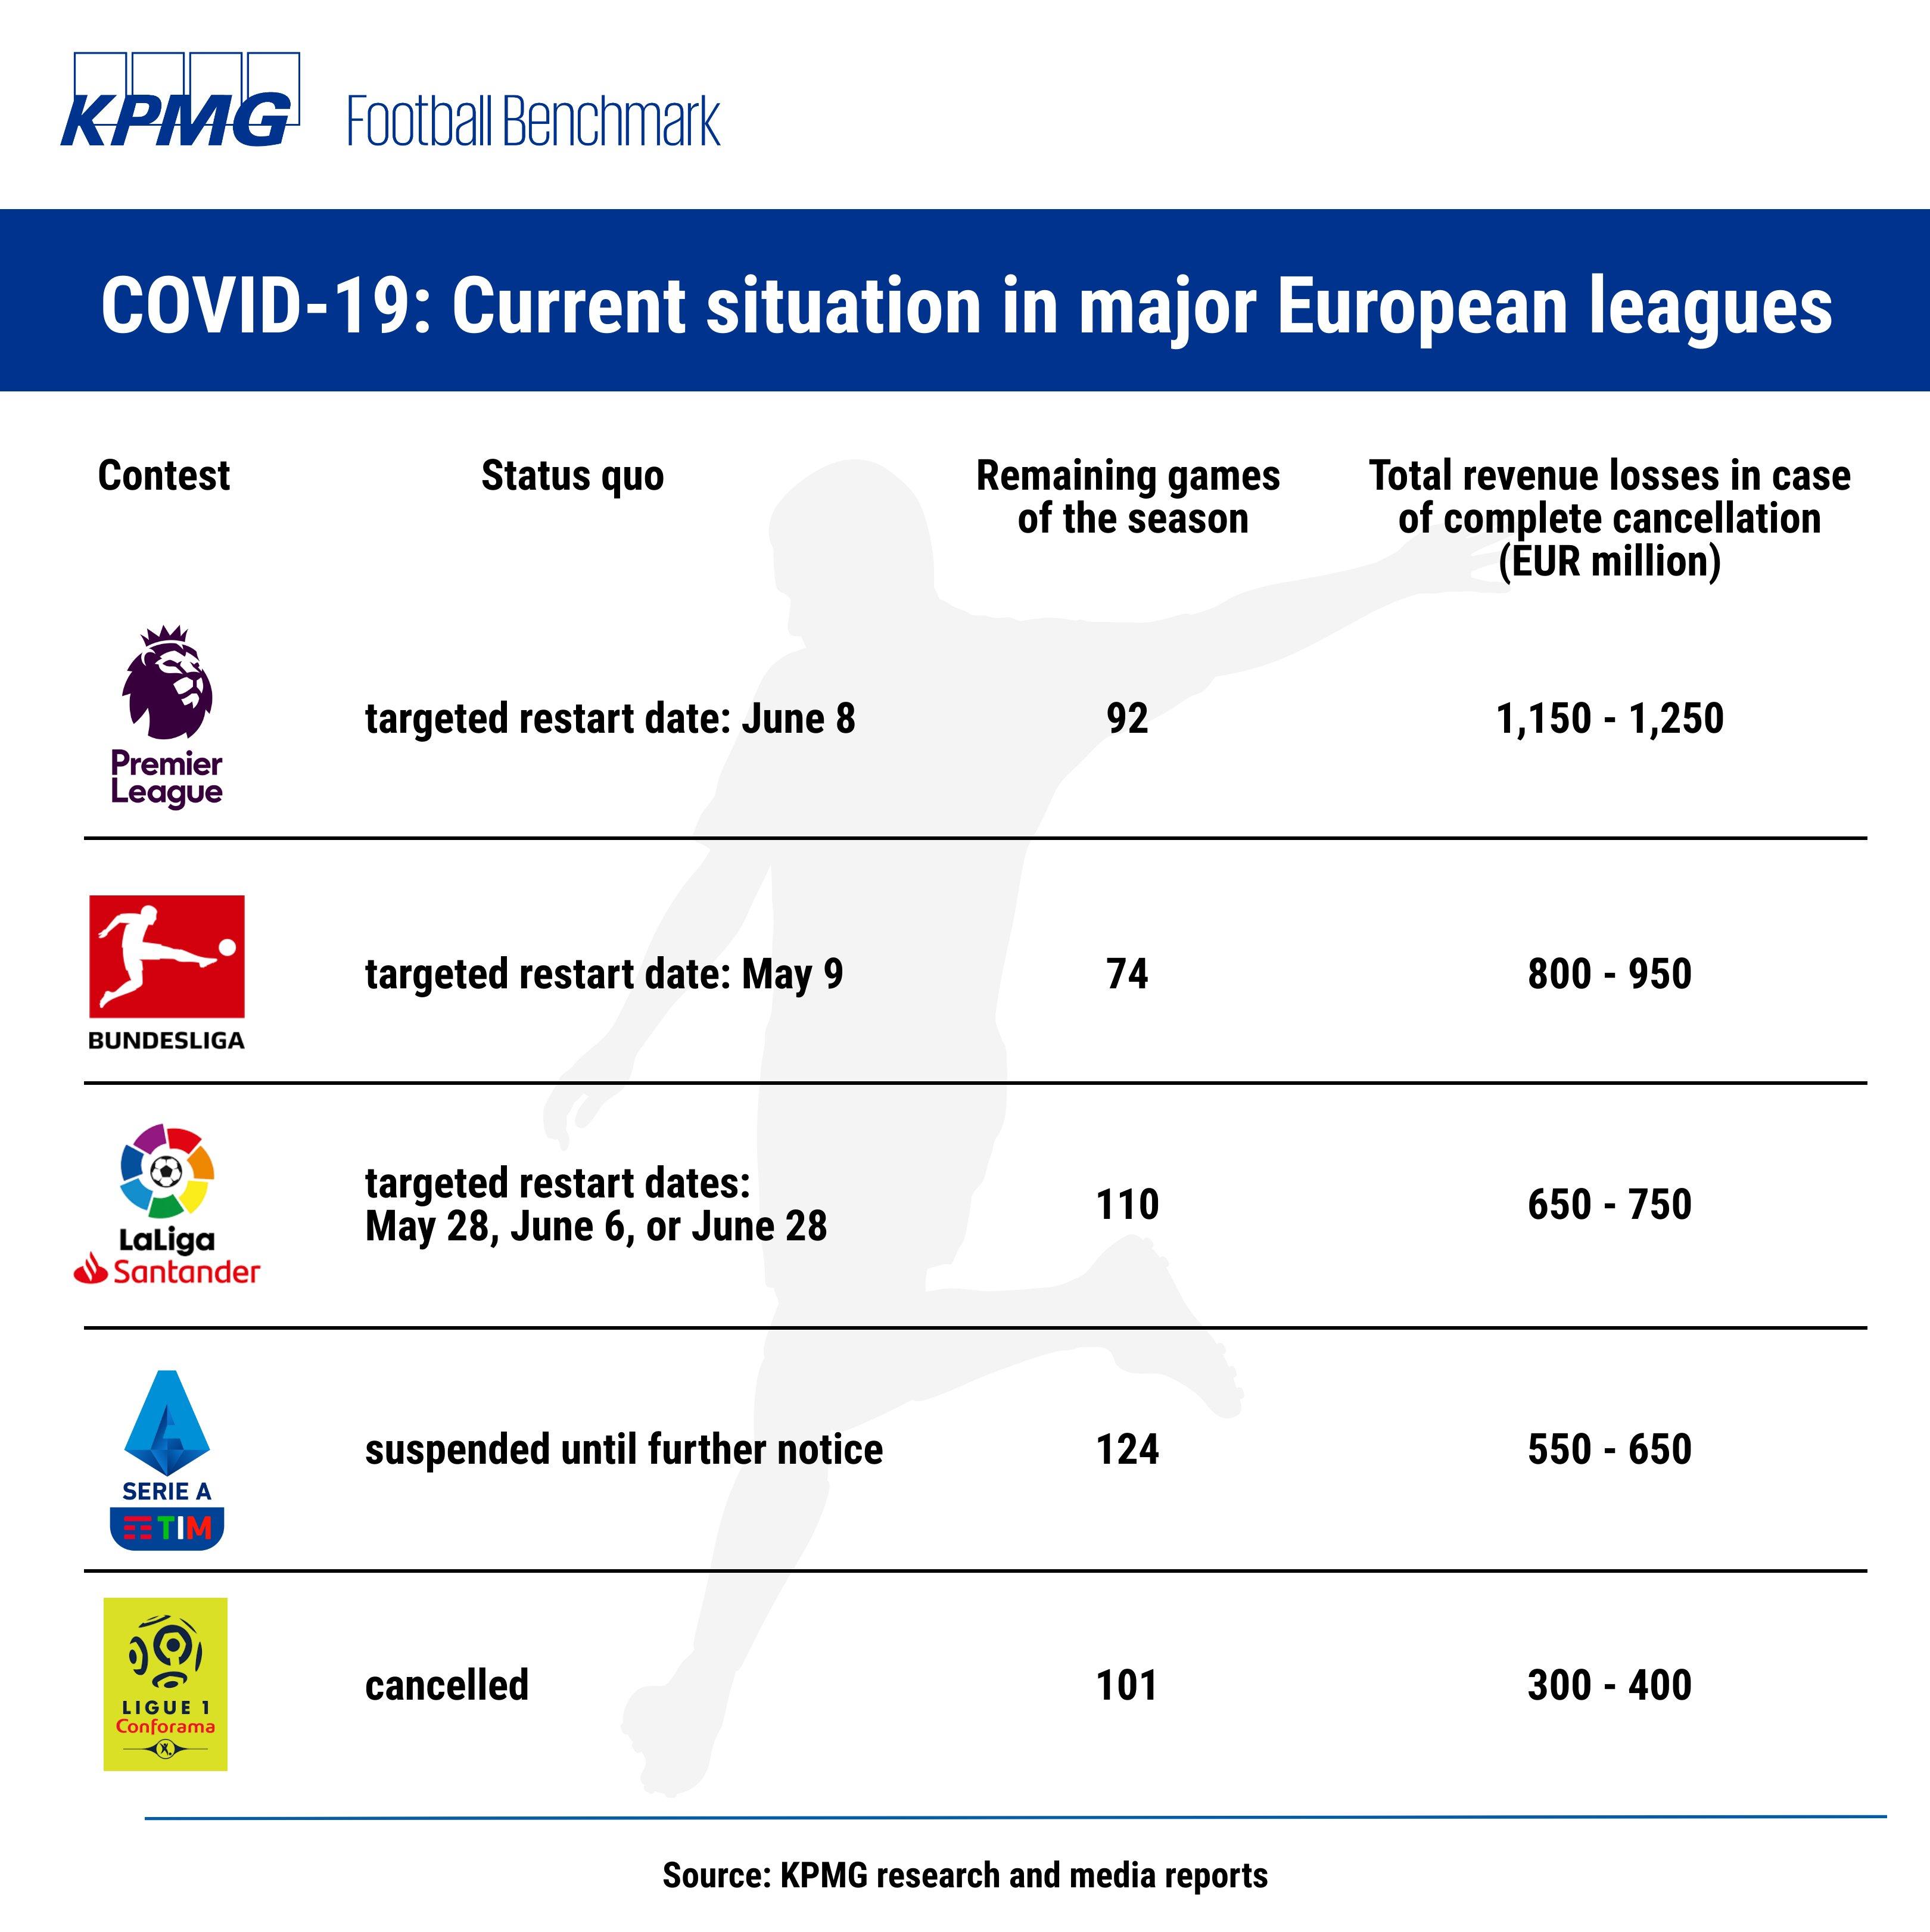 KPMG football benchmark